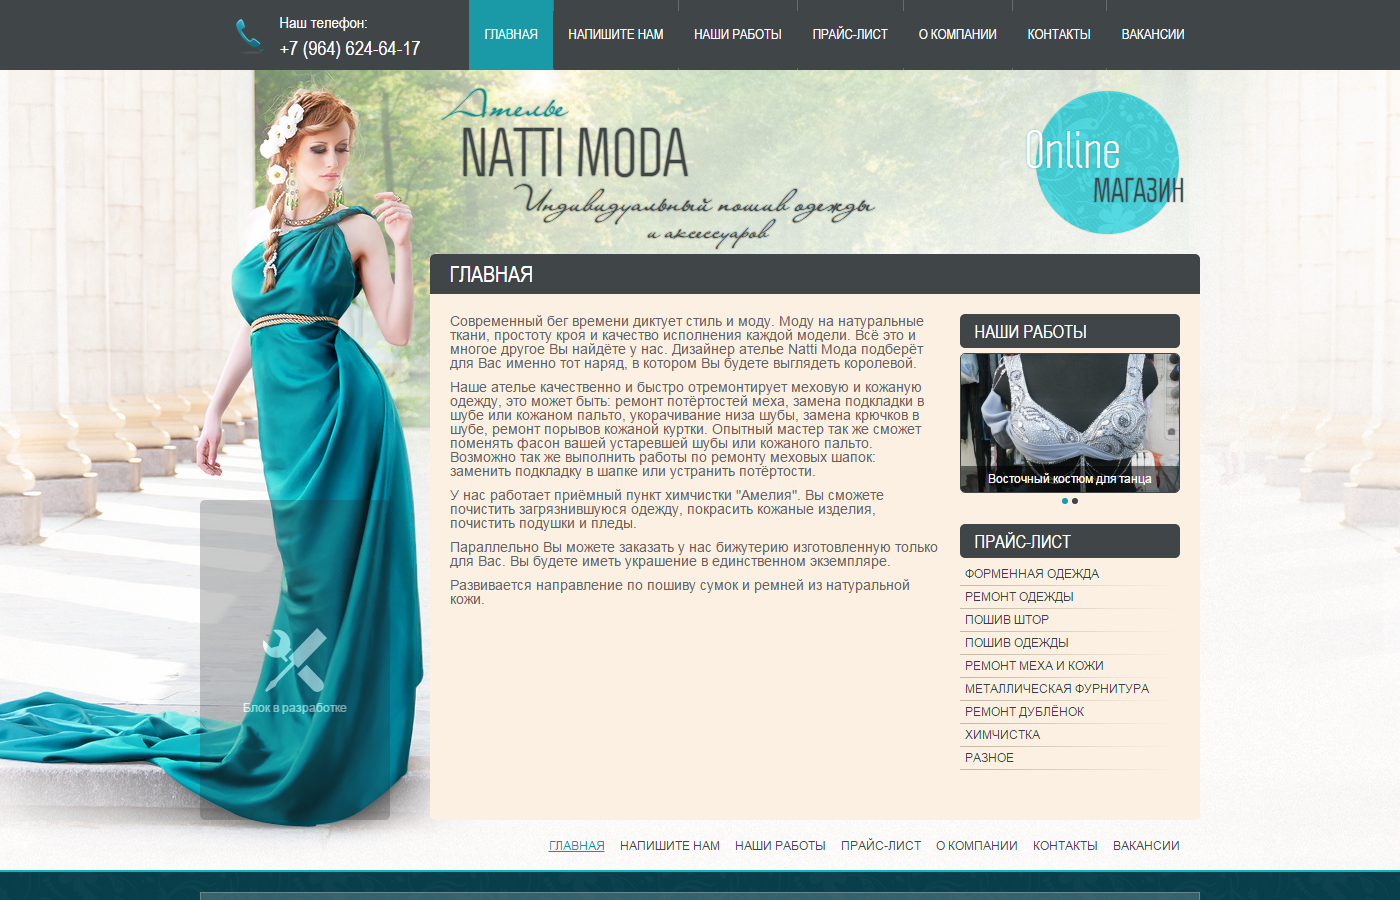 2015 - Сайт ателье Natti Moda